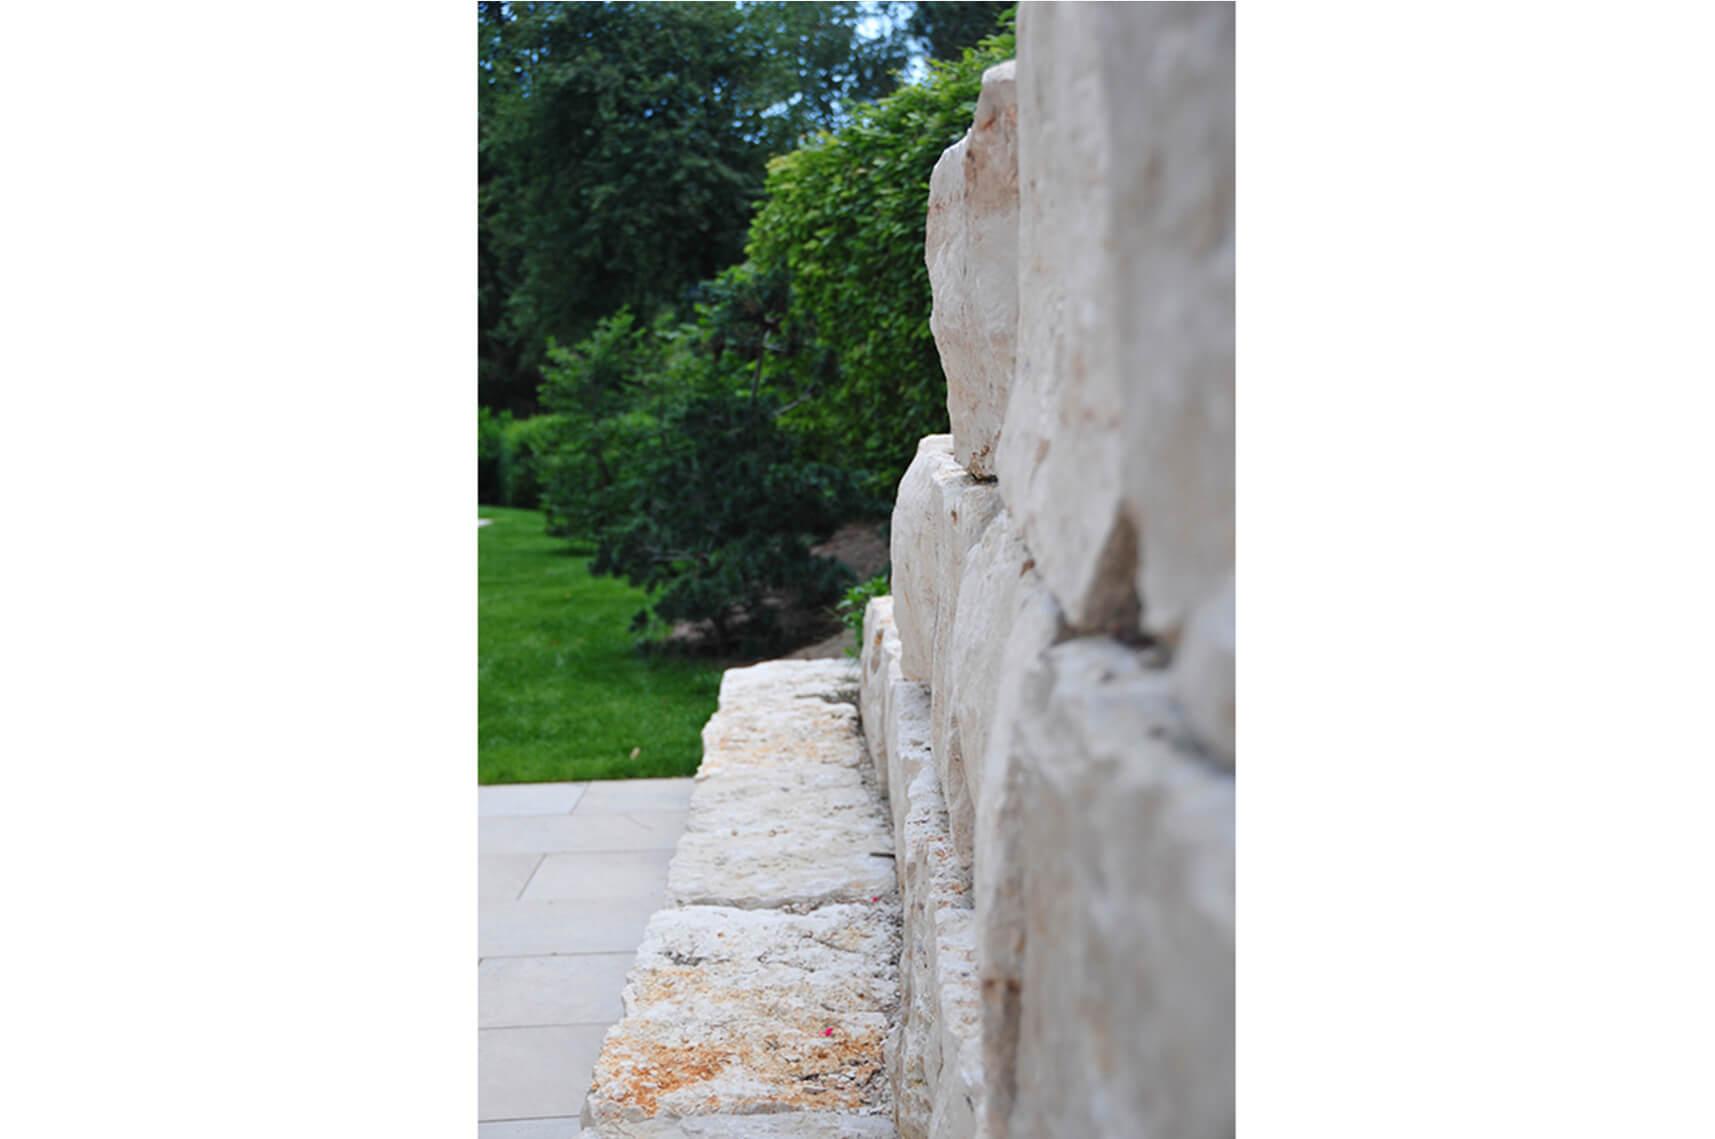 paysagiste tramelan villa terrasse jardin mur en pierres calcaires aellig paysages (7)